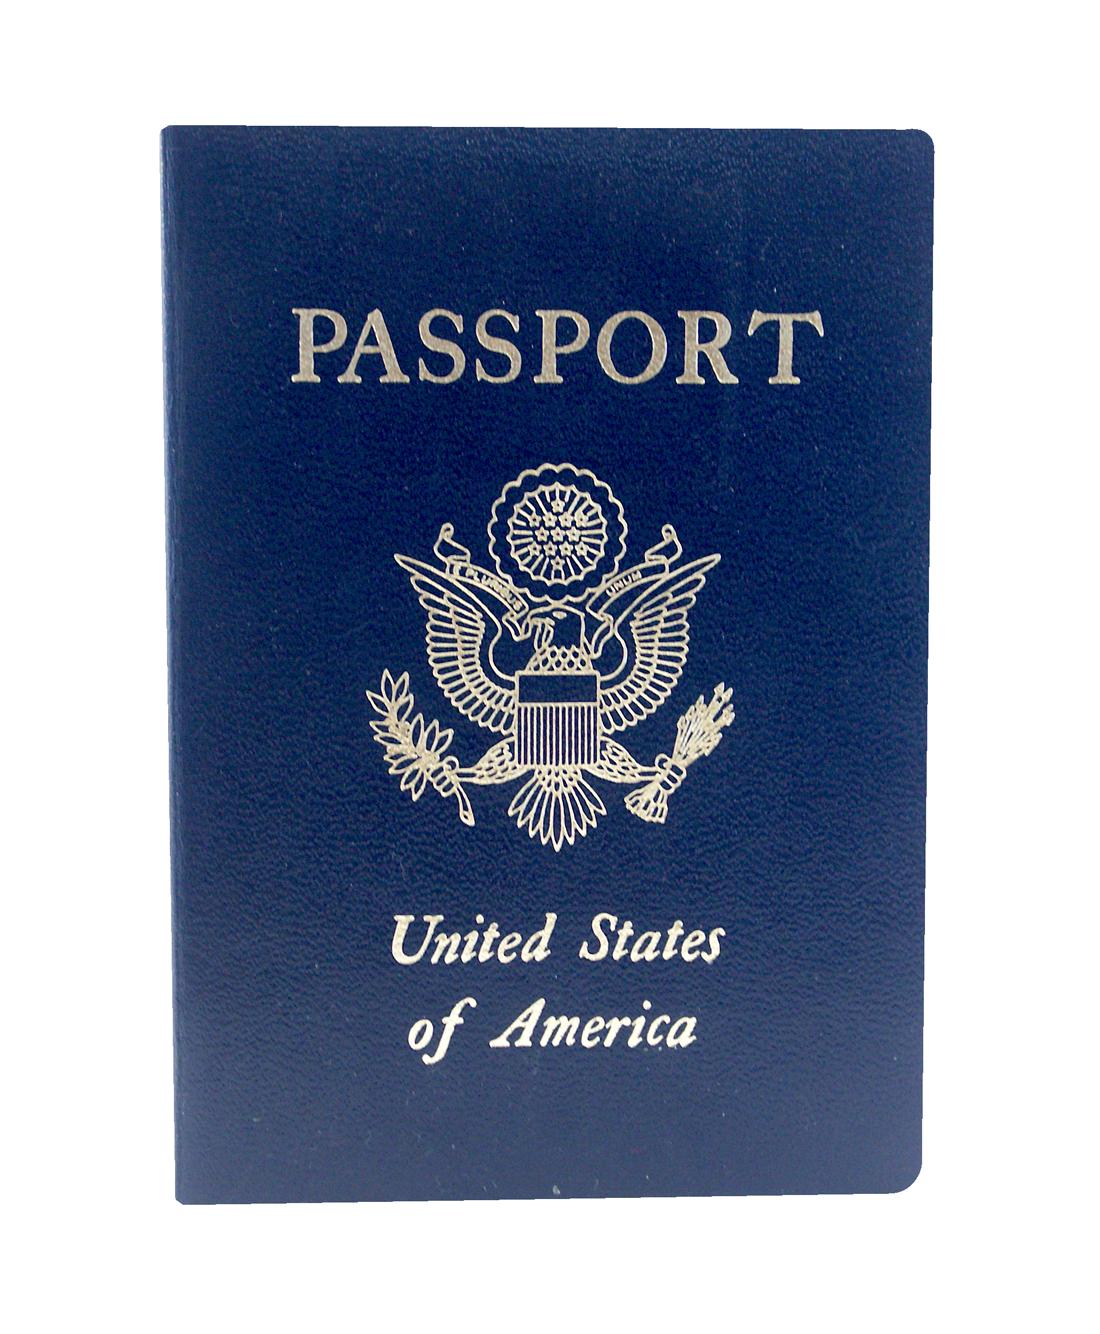 Passport clipart transparent background passport. Png image best stock